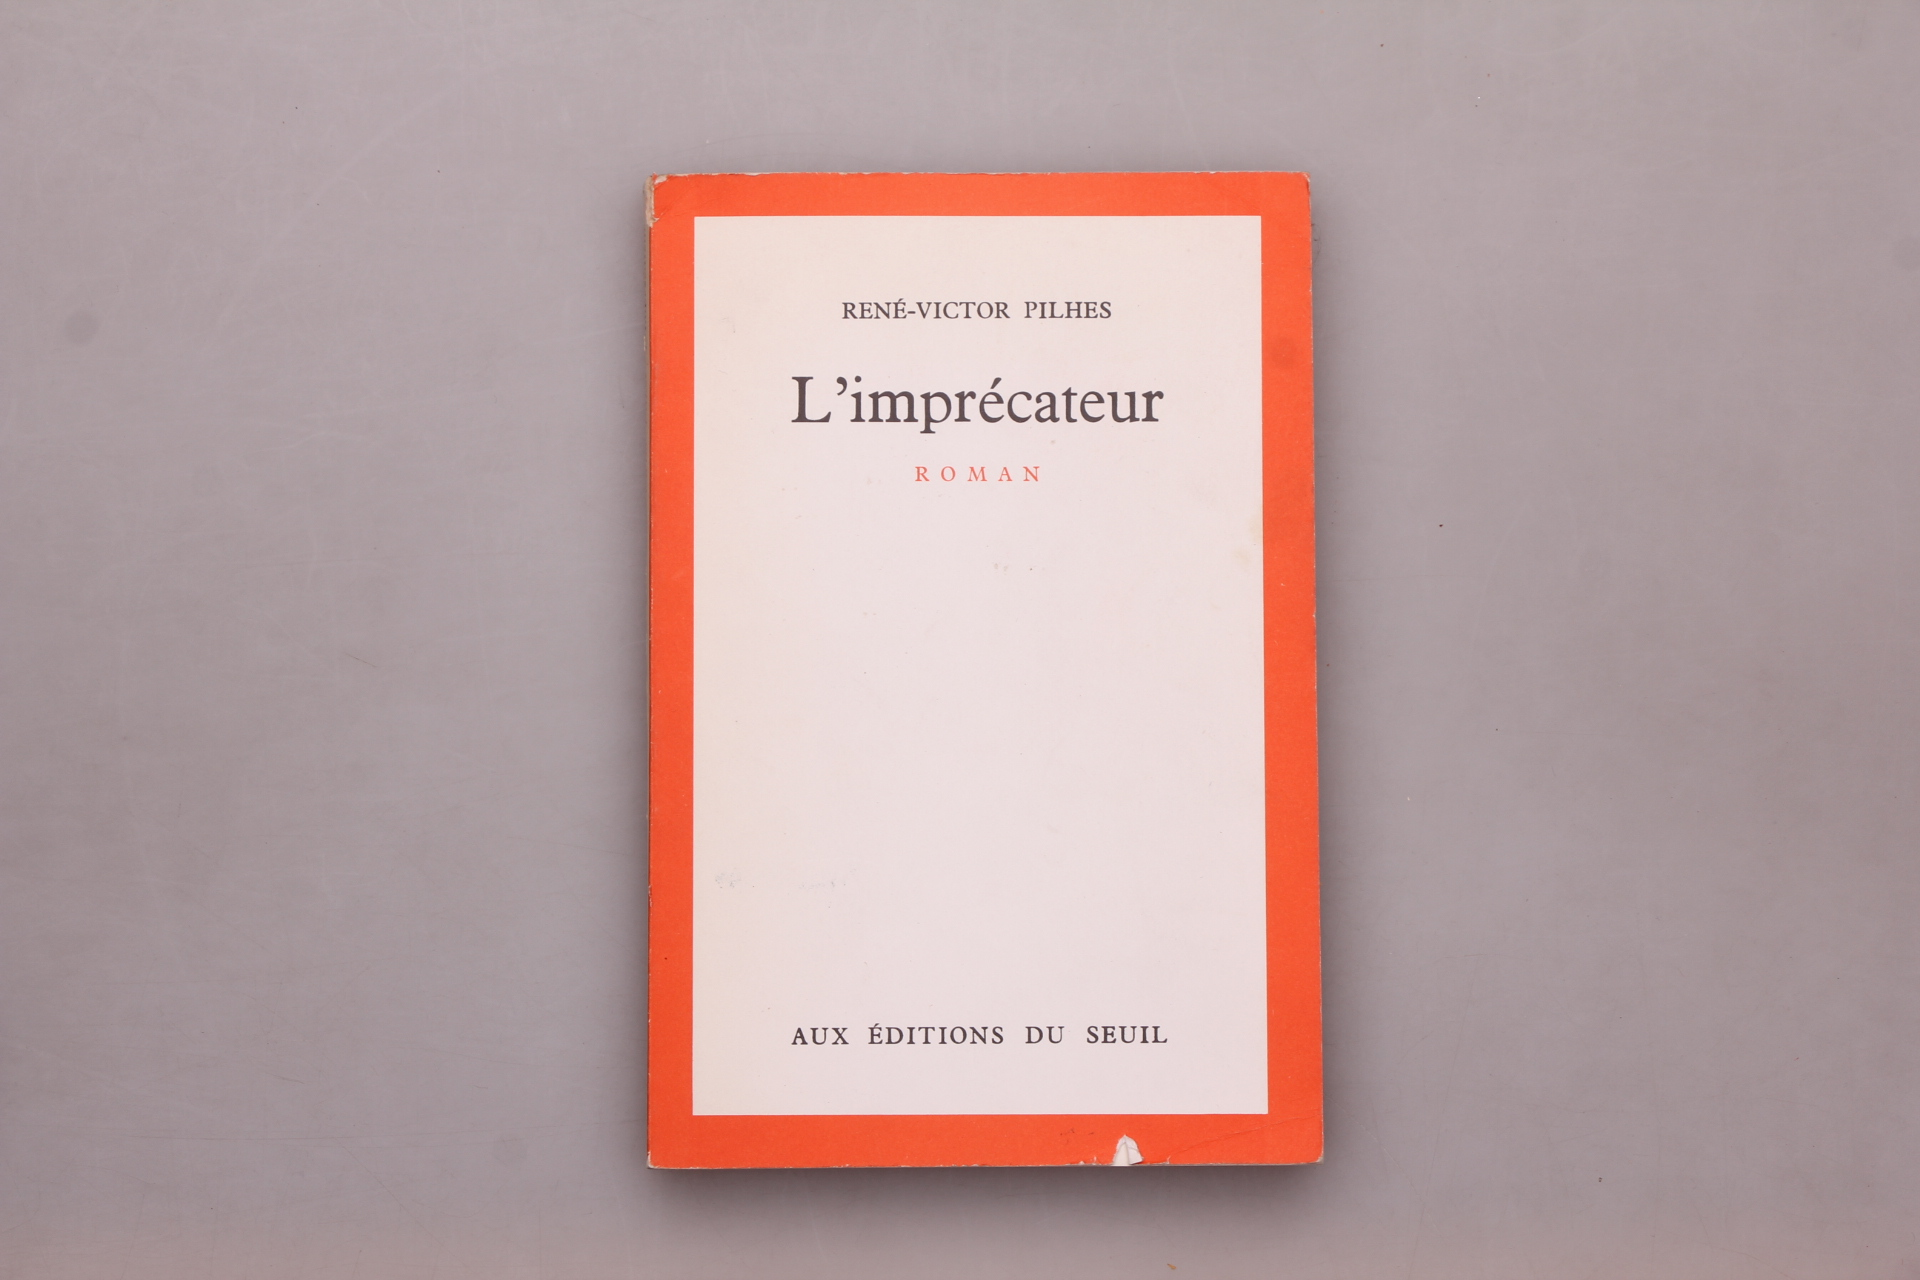 Pilhes, Rene-Victor L IMPRECATEUR